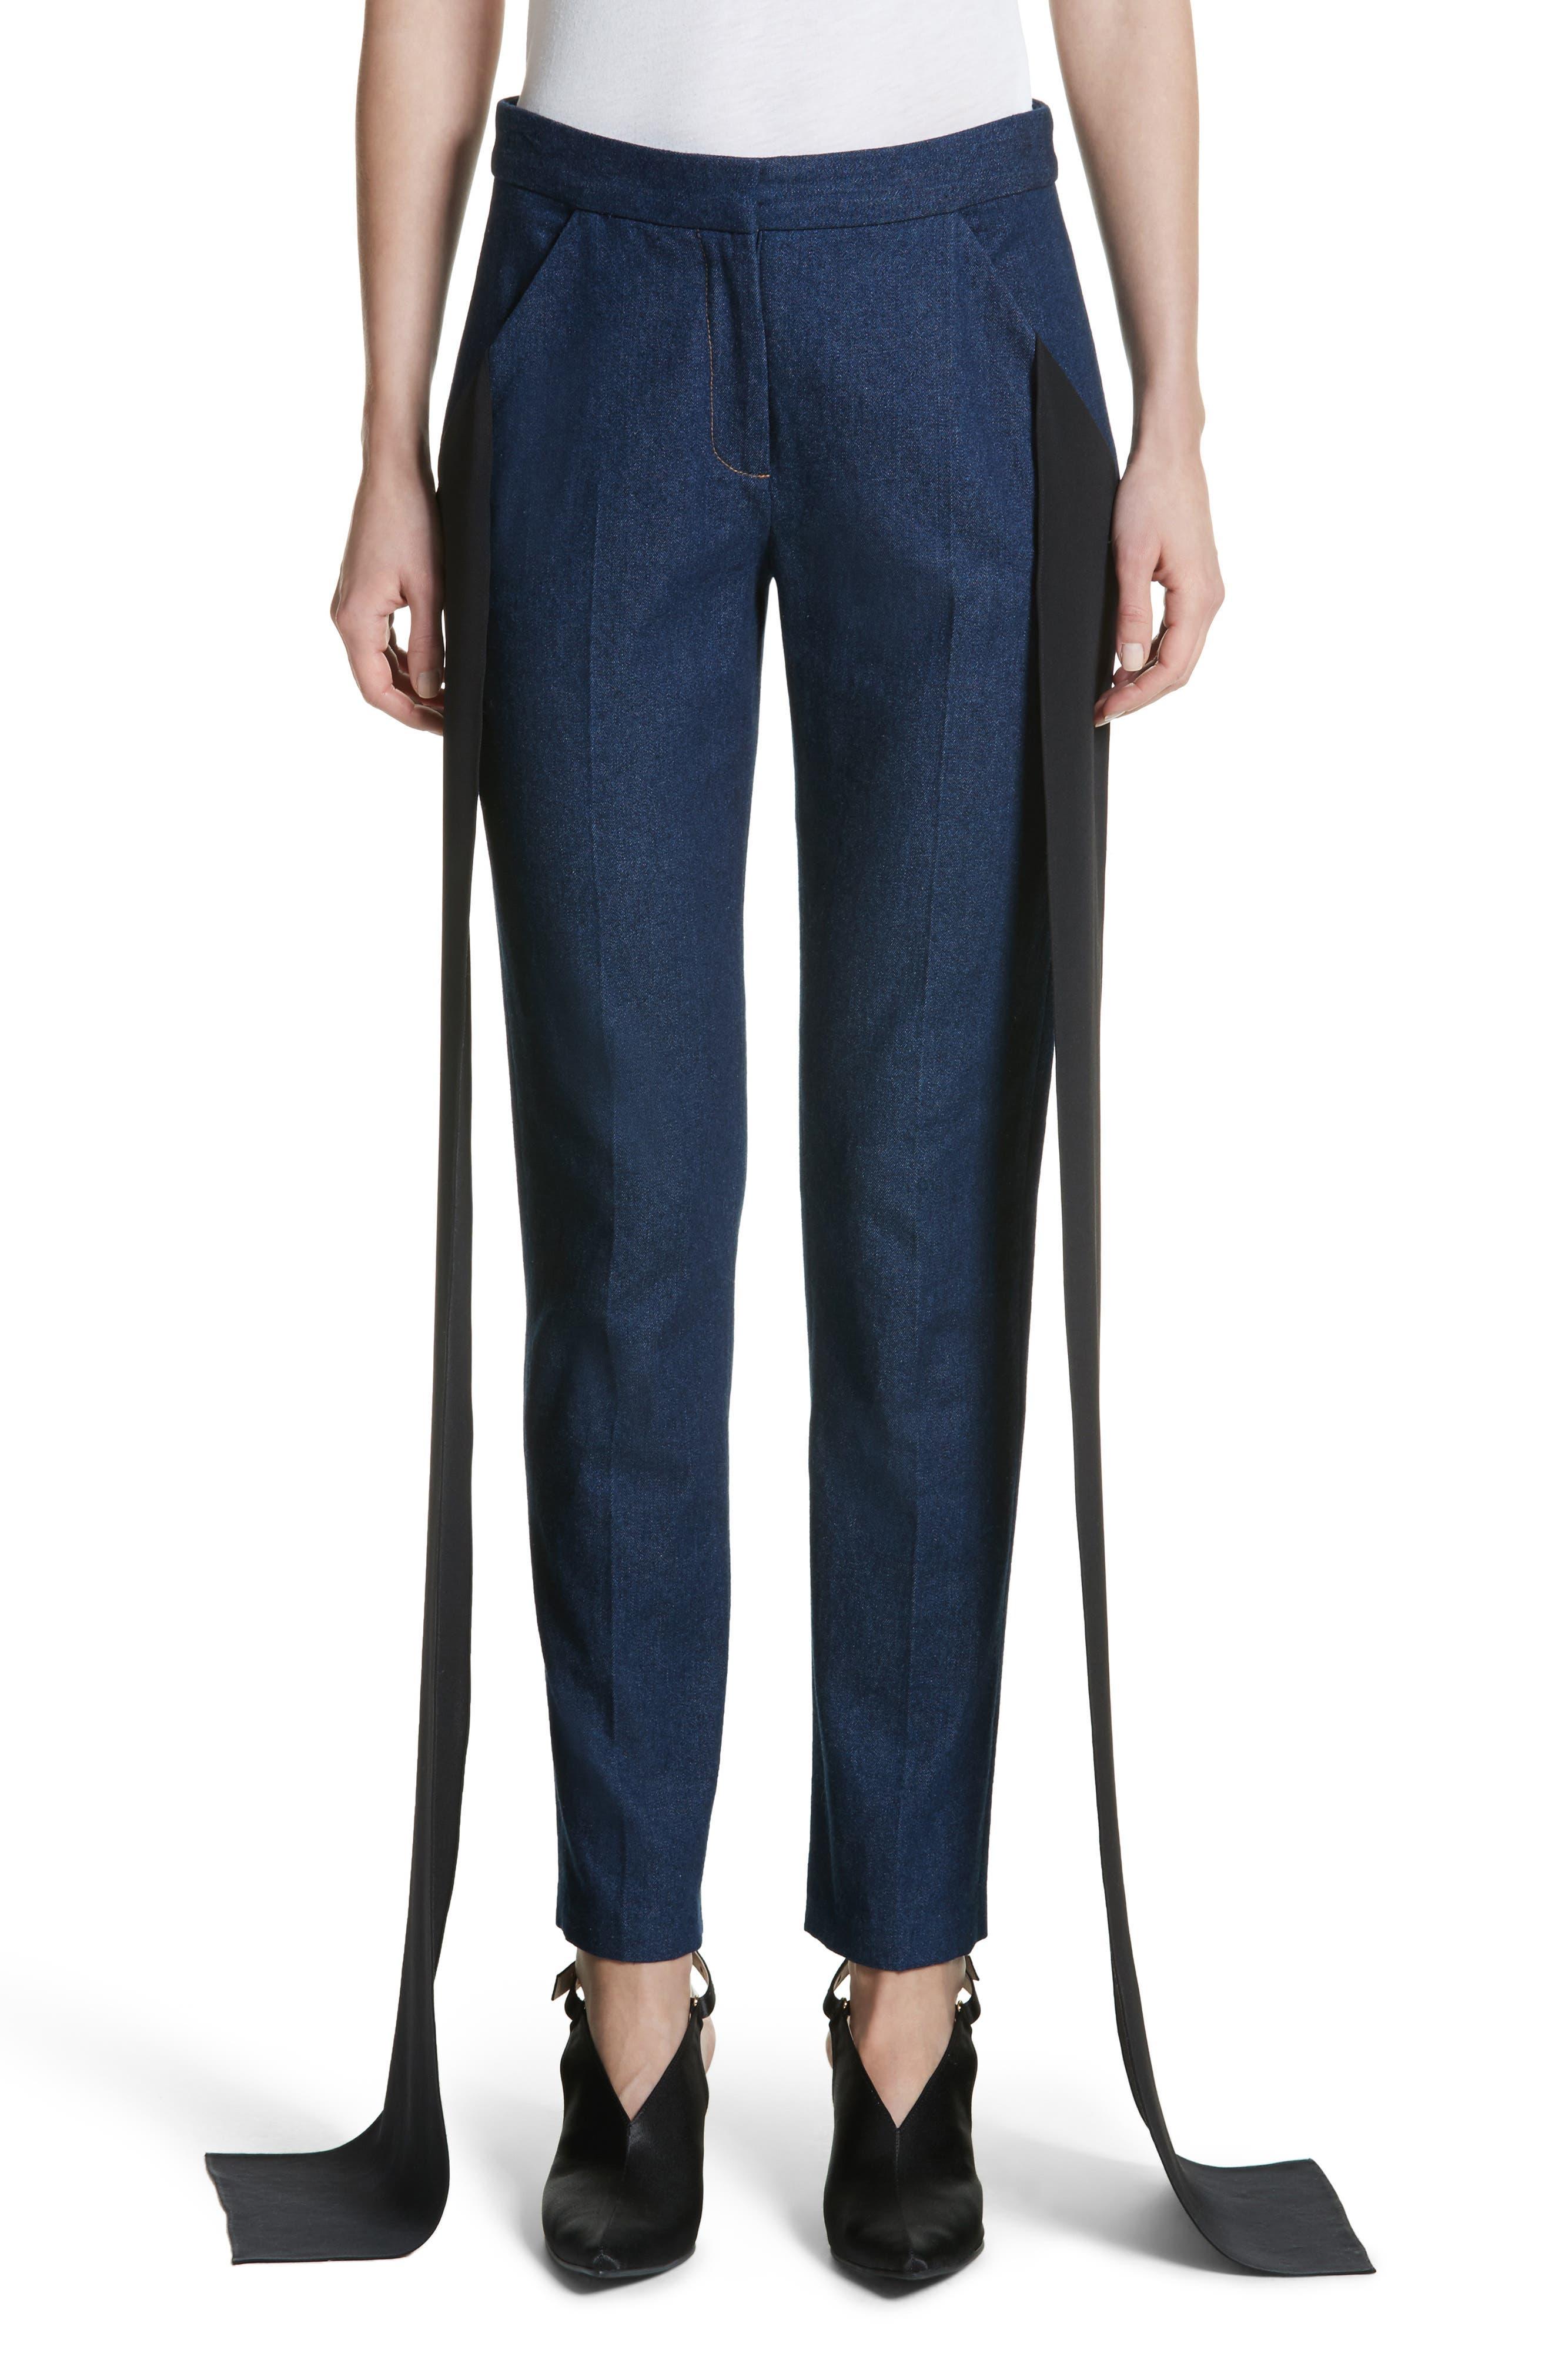 Mojave Side Panel Skinny Jeans,                             Main thumbnail 1, color,                             Dark Wash Denim